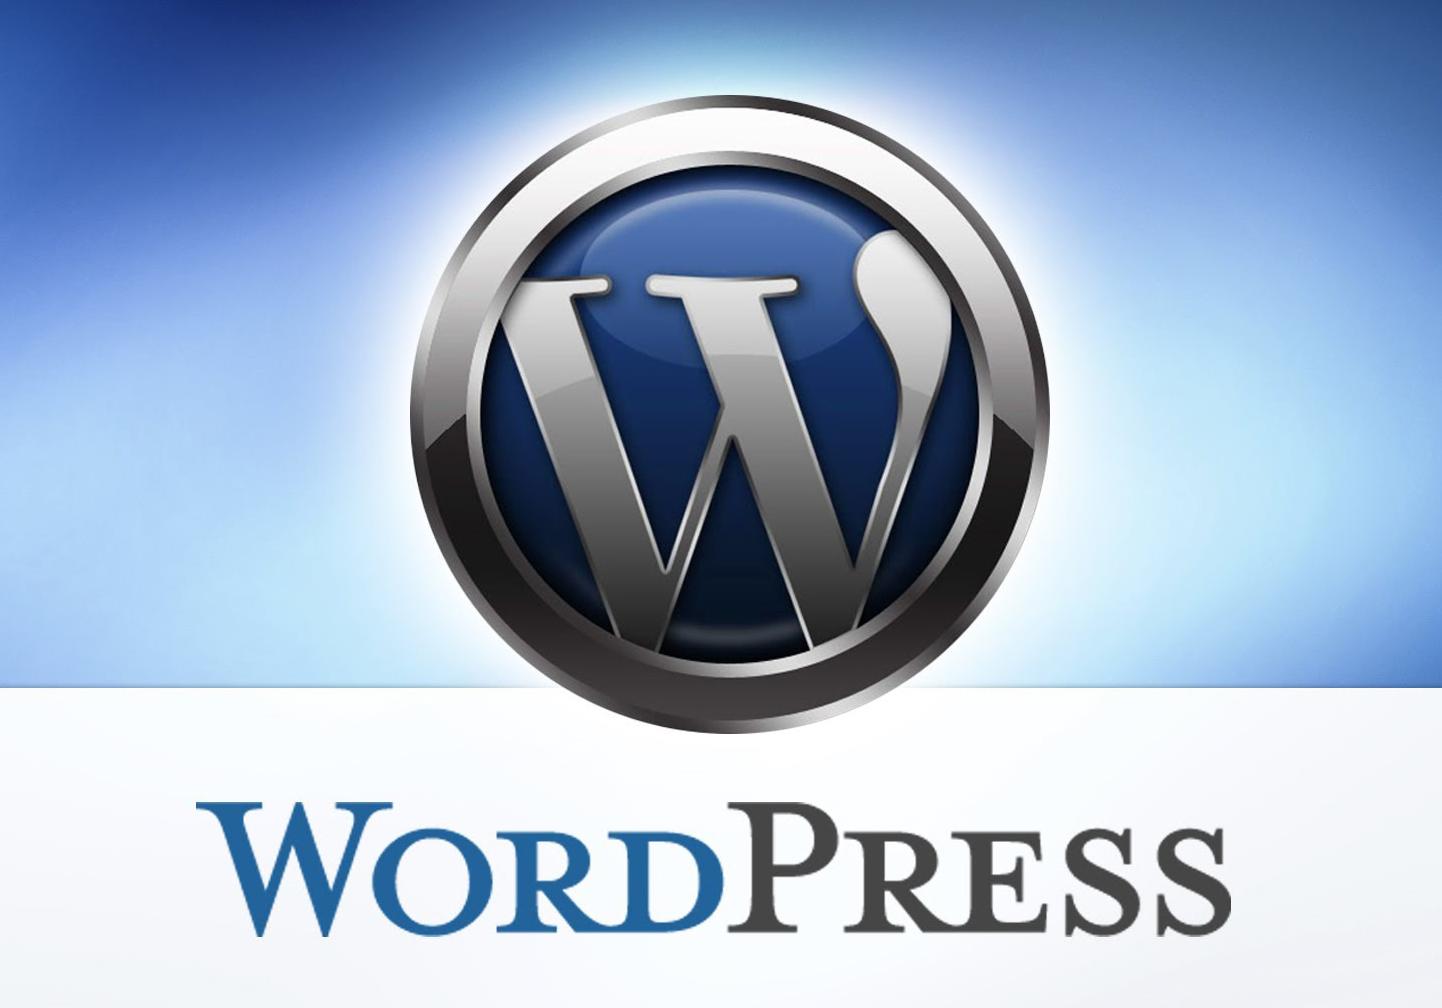 Create a professional website on WordPress